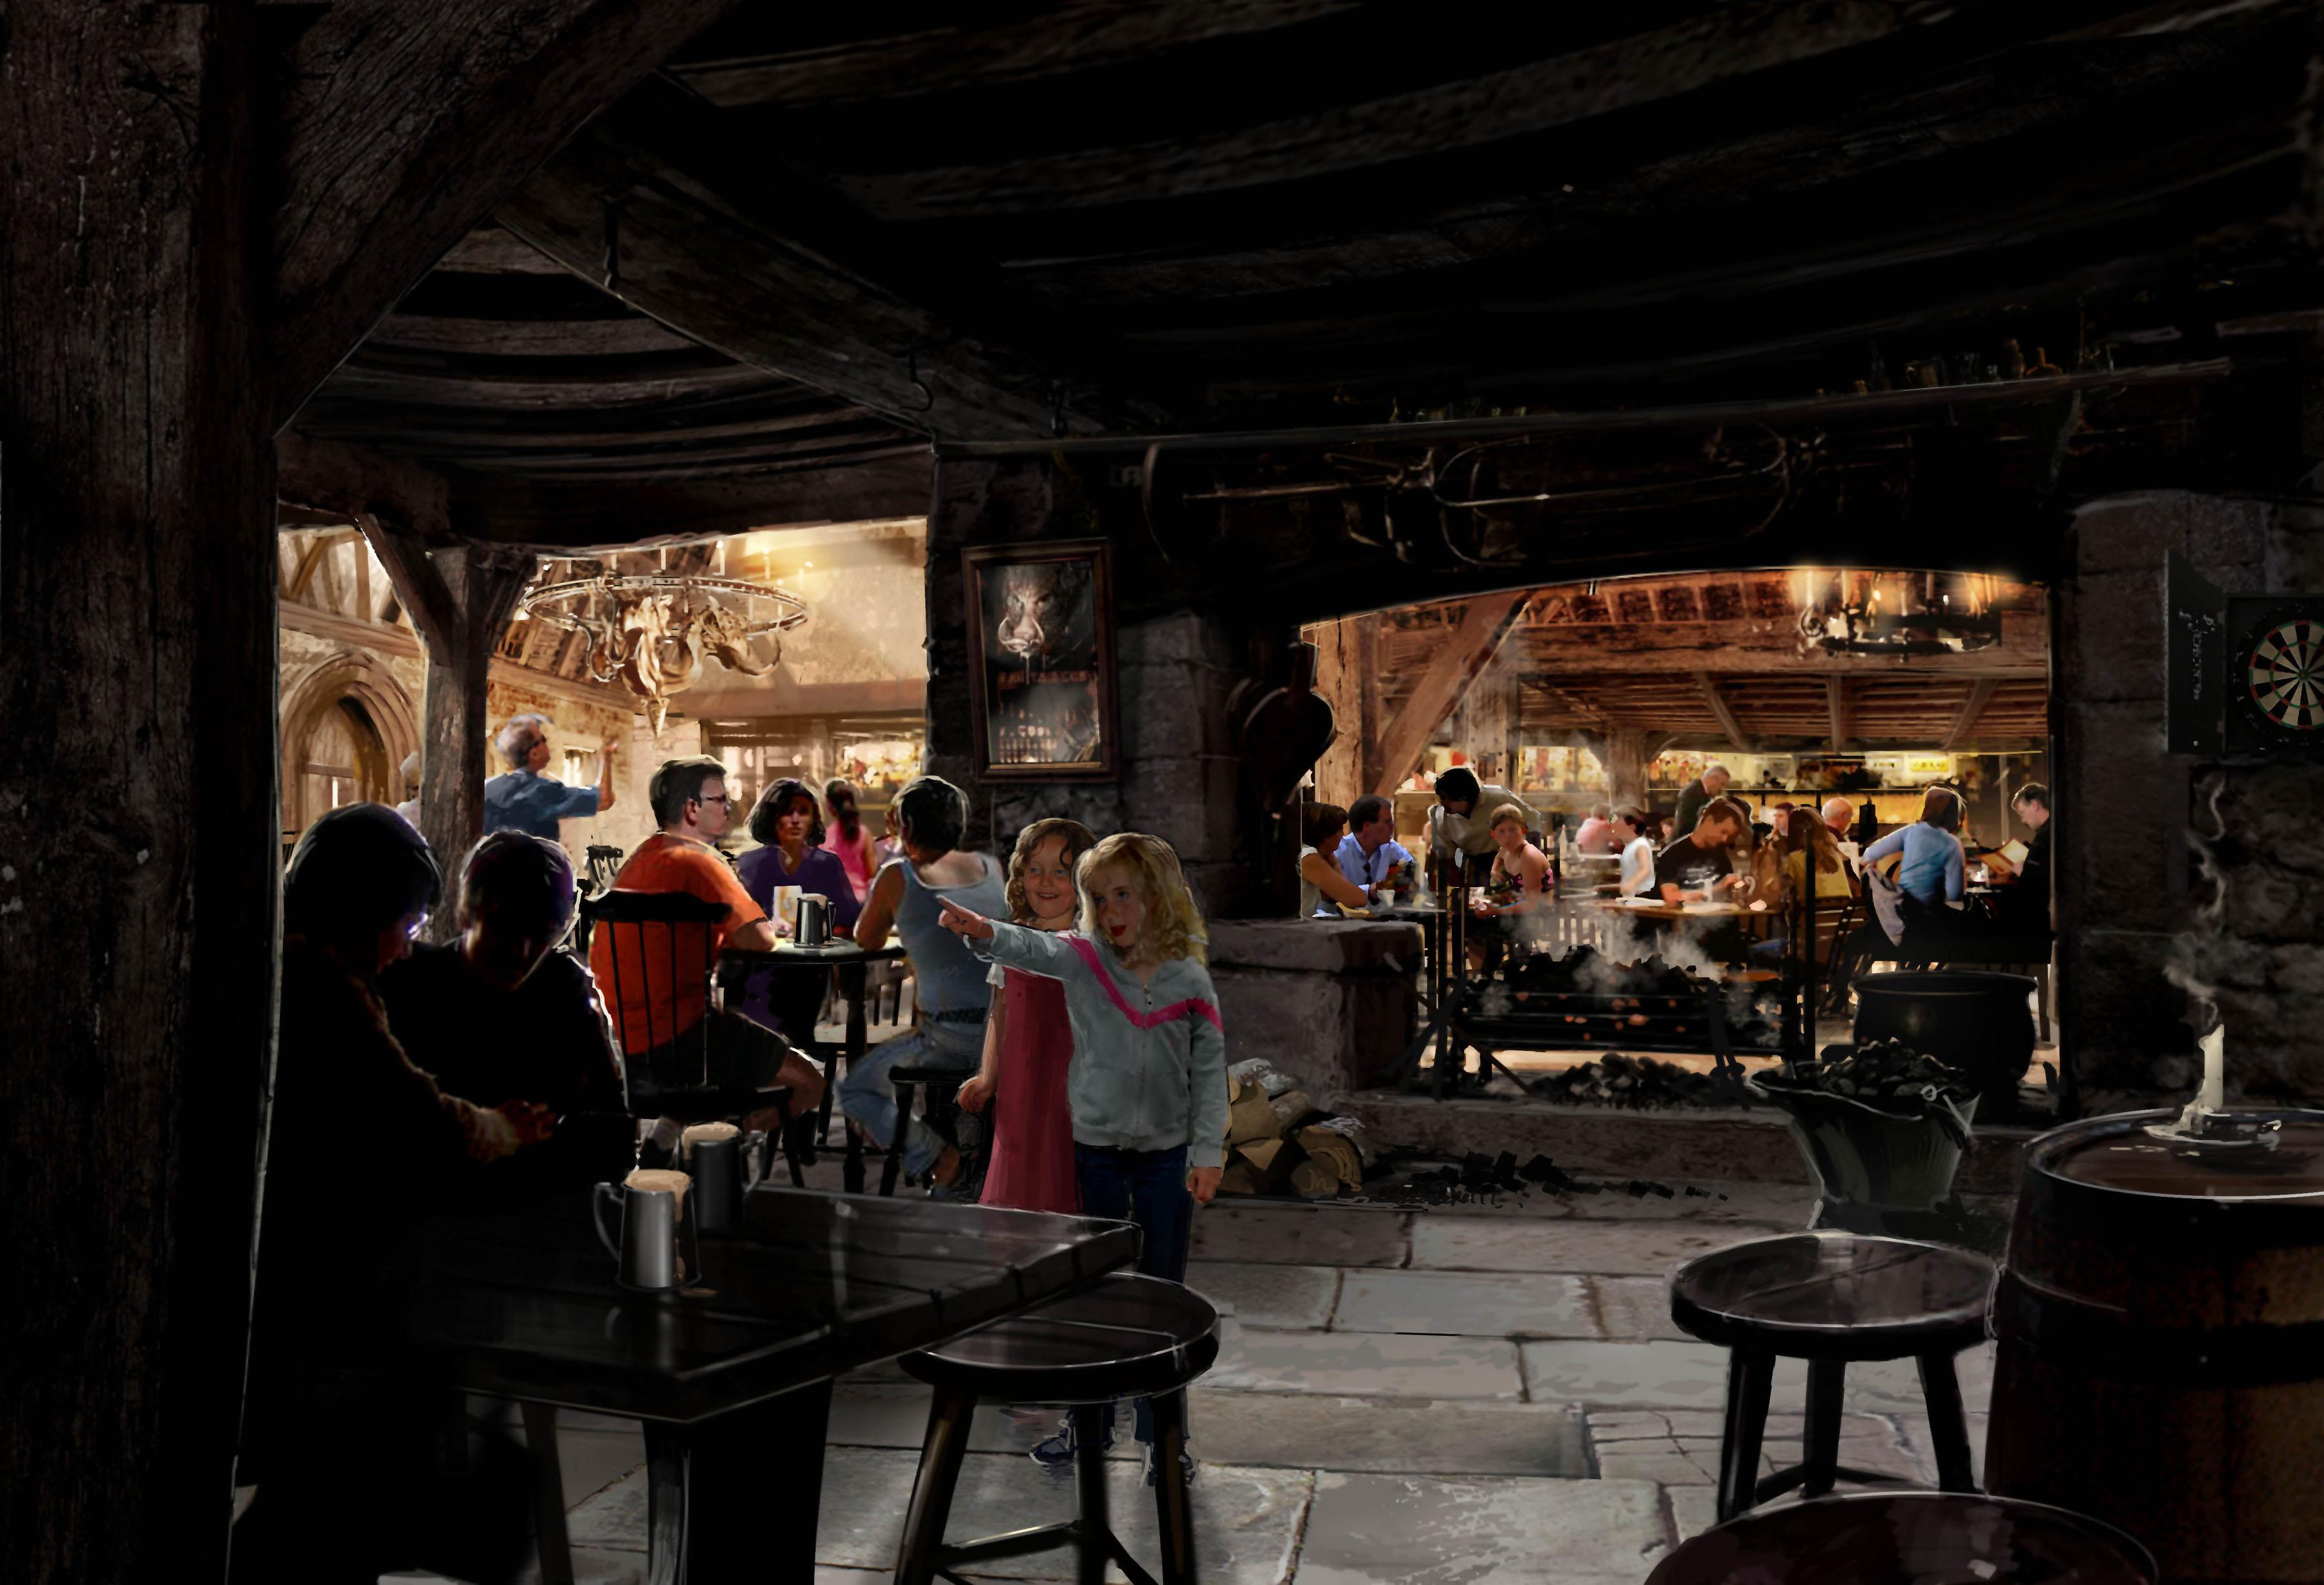 Hogs Head Pub Interior wallpaper   Click picture for high 3600x2455